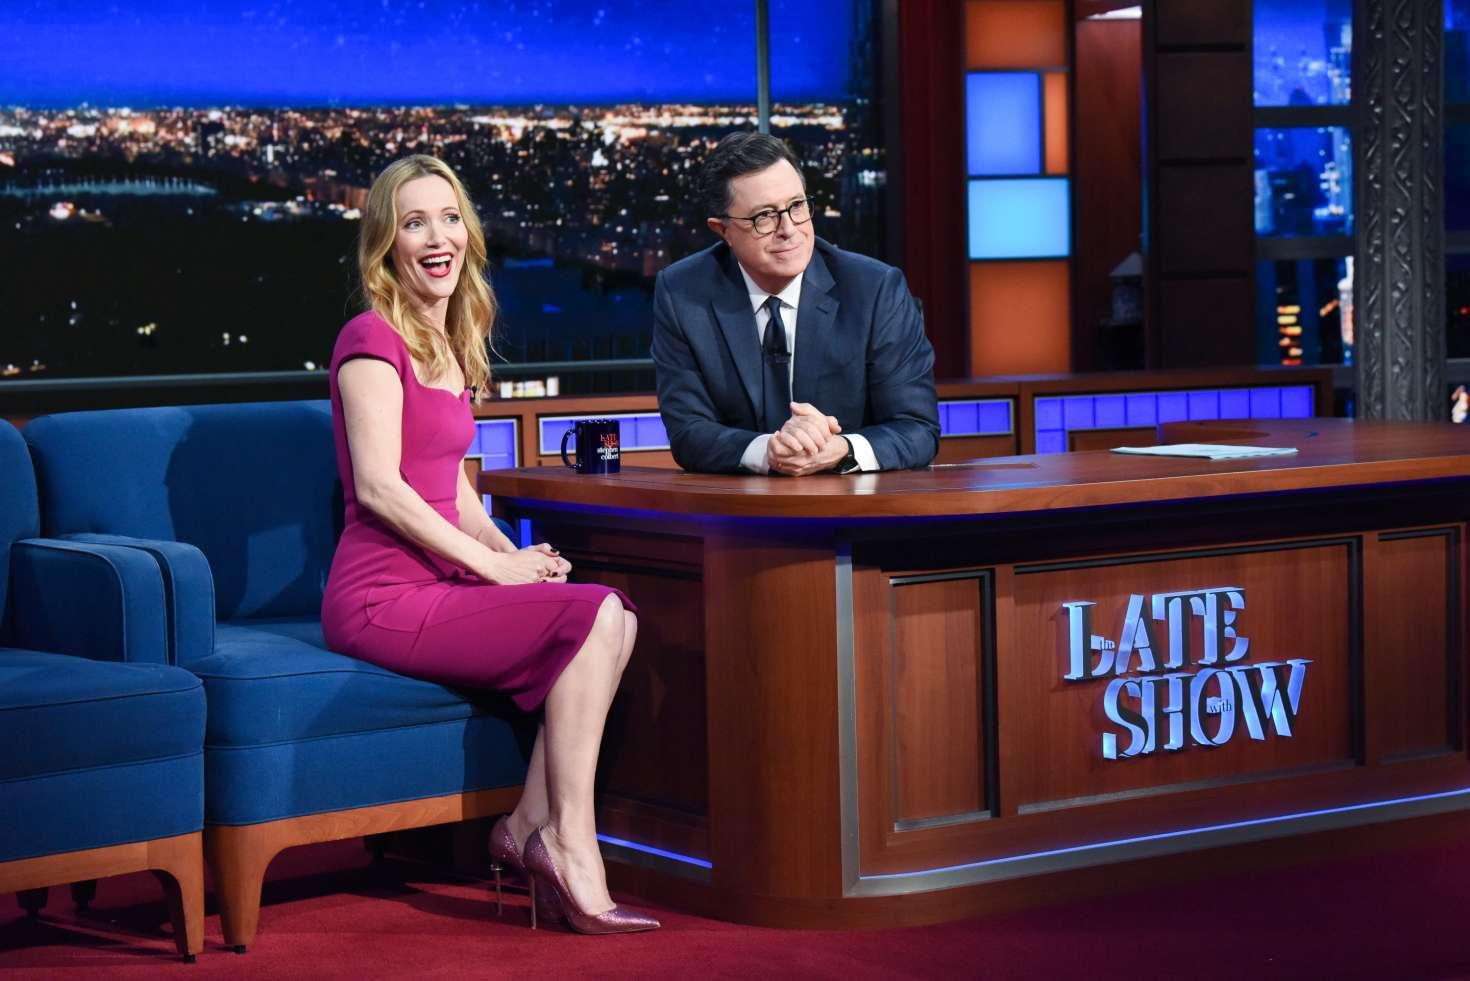 Leslie Mann 2018 : Leslie Mann on The Late Show With Stephen Colbert -02